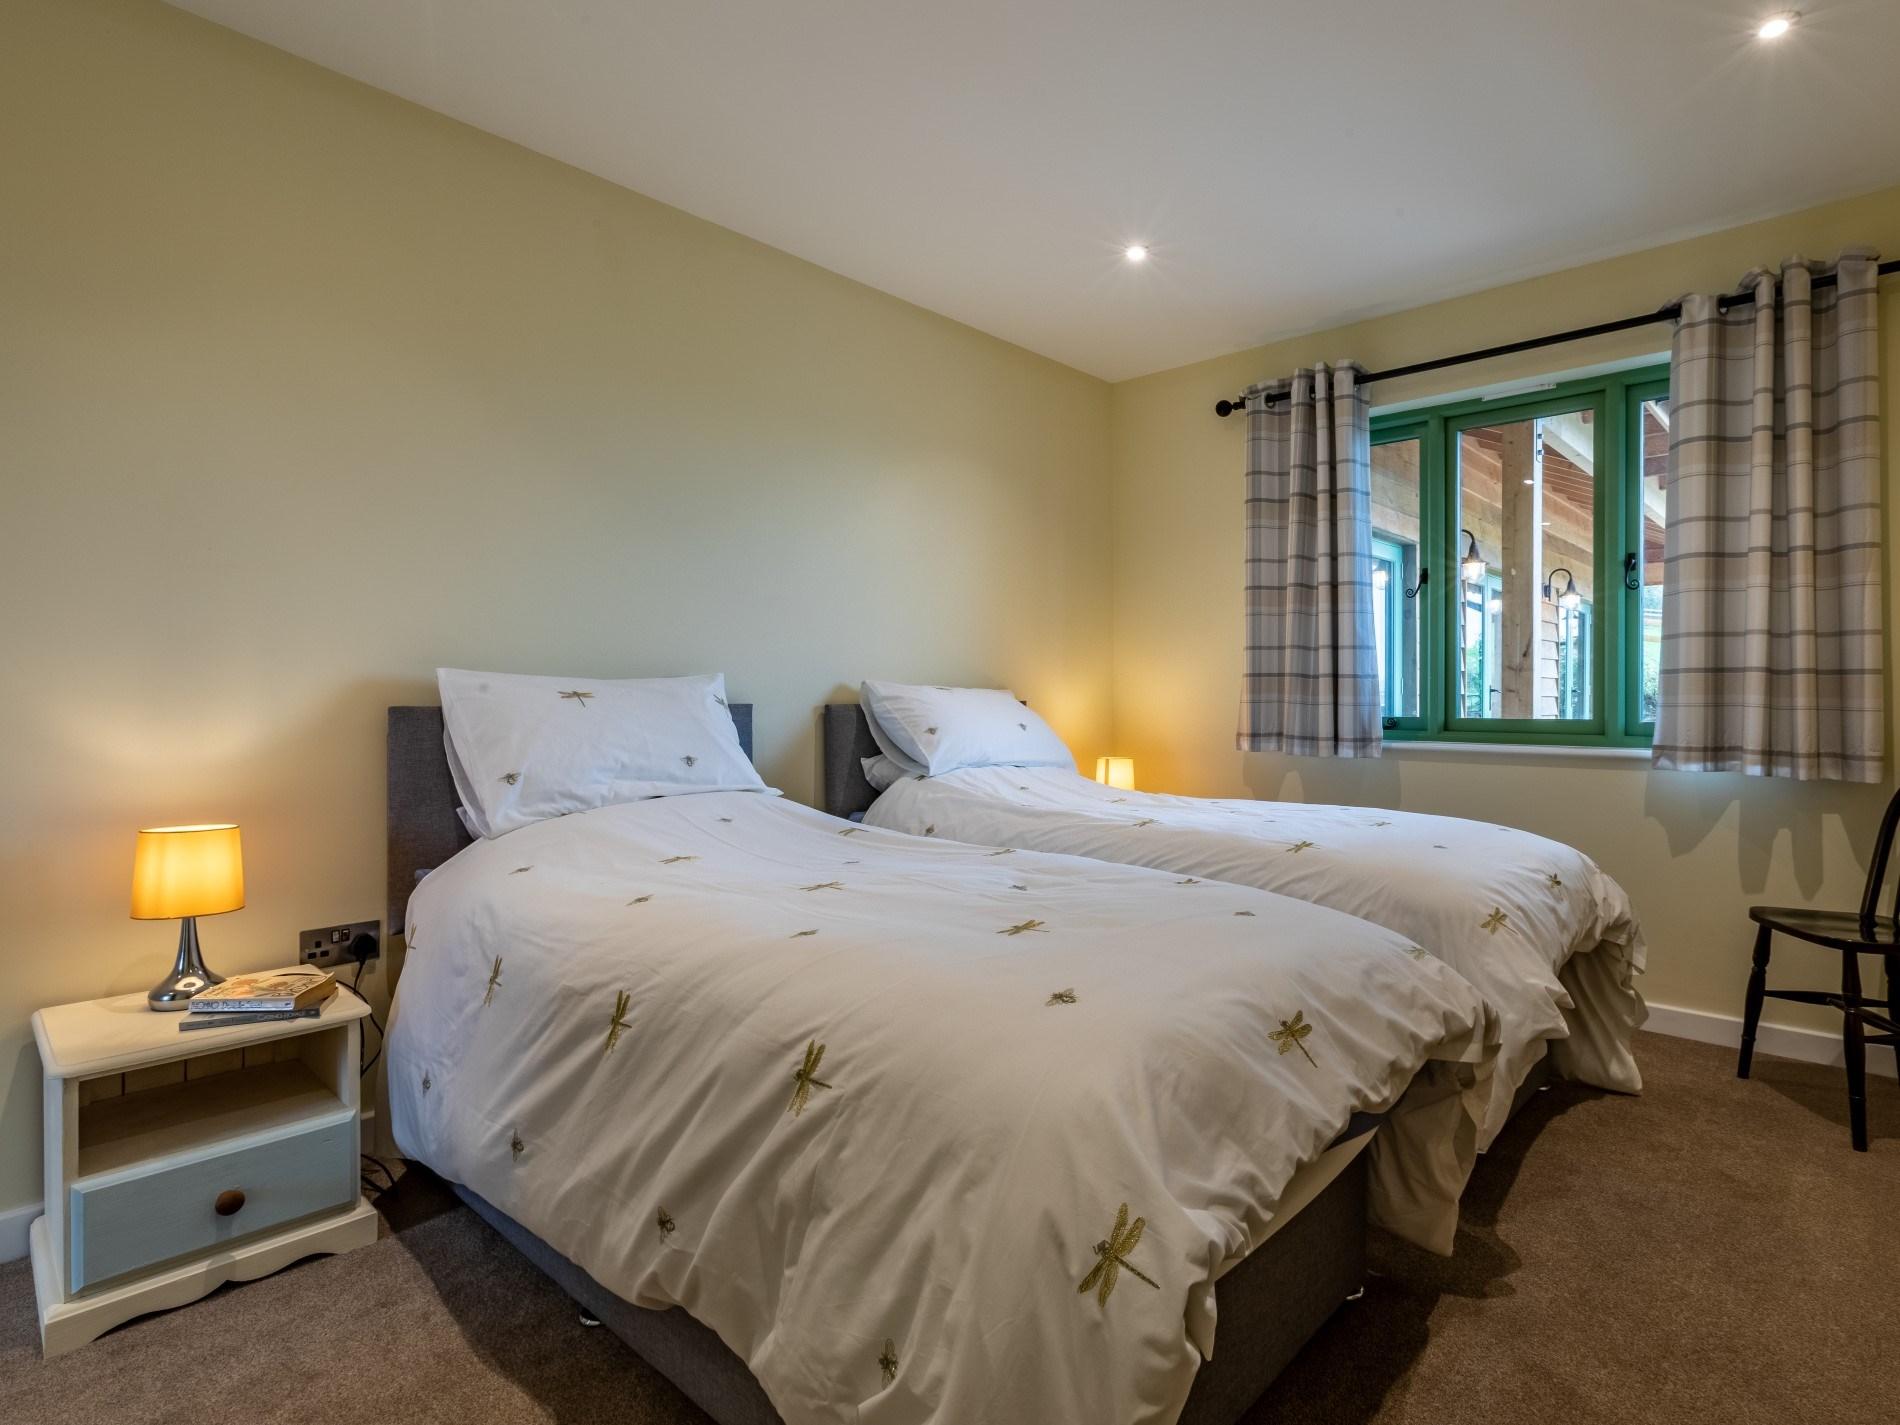 6 Bedroom Cottage in Tiverton, Devon